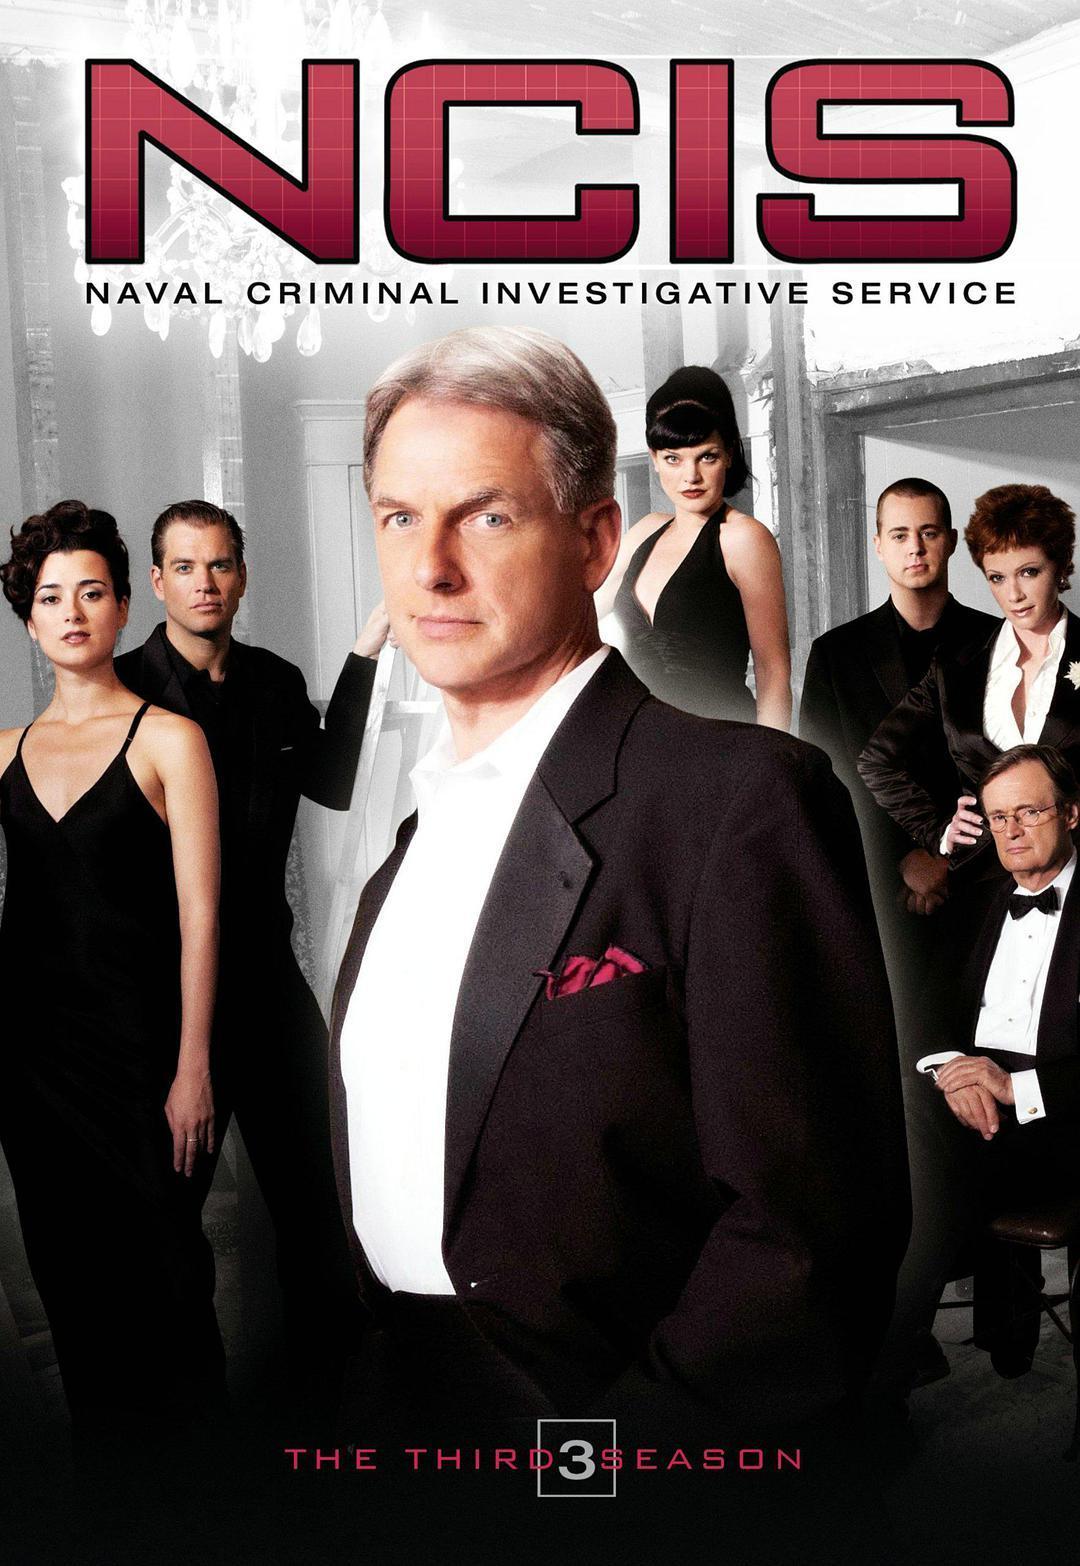 NCIS: Naval Criminal Investigative Service Season 3